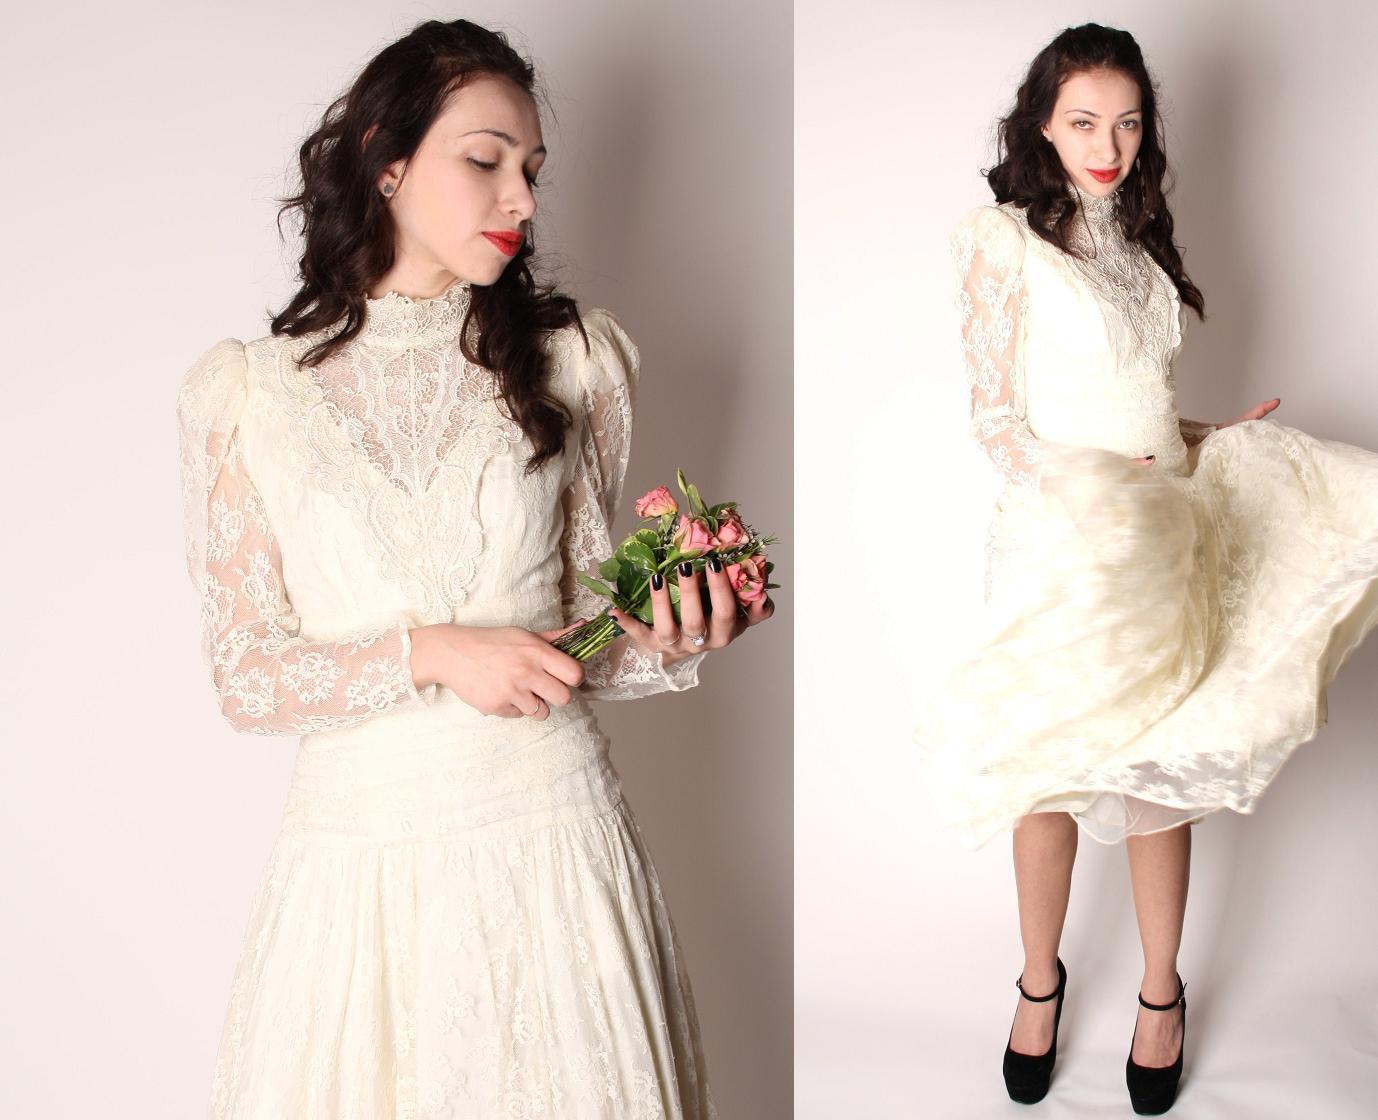 Vintage 60s victorian style renaissance lace wedding dress for 60s style wedding dresses